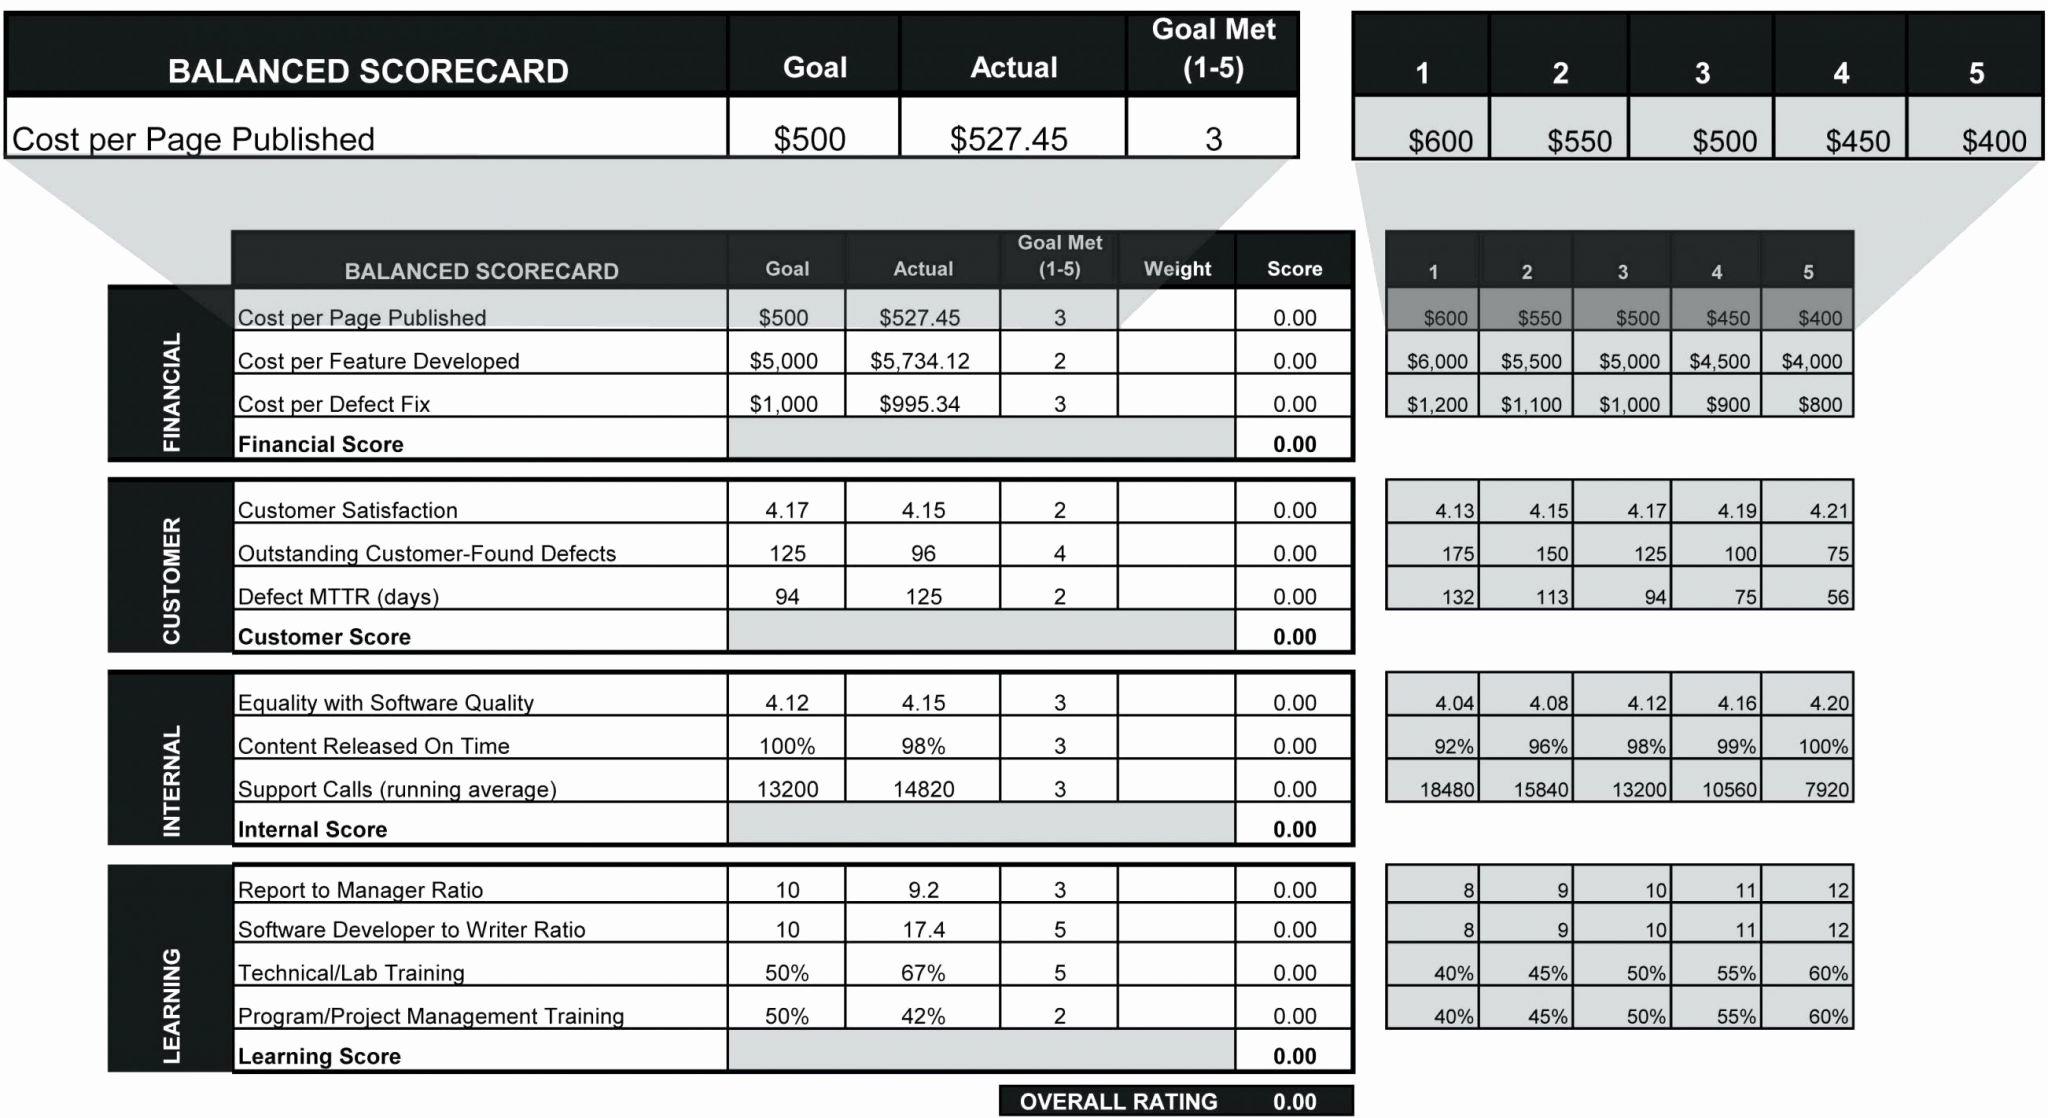 Employee Performance Scorecard Template Elegant Employee Performance Scorecard Template Excel and Best Hr